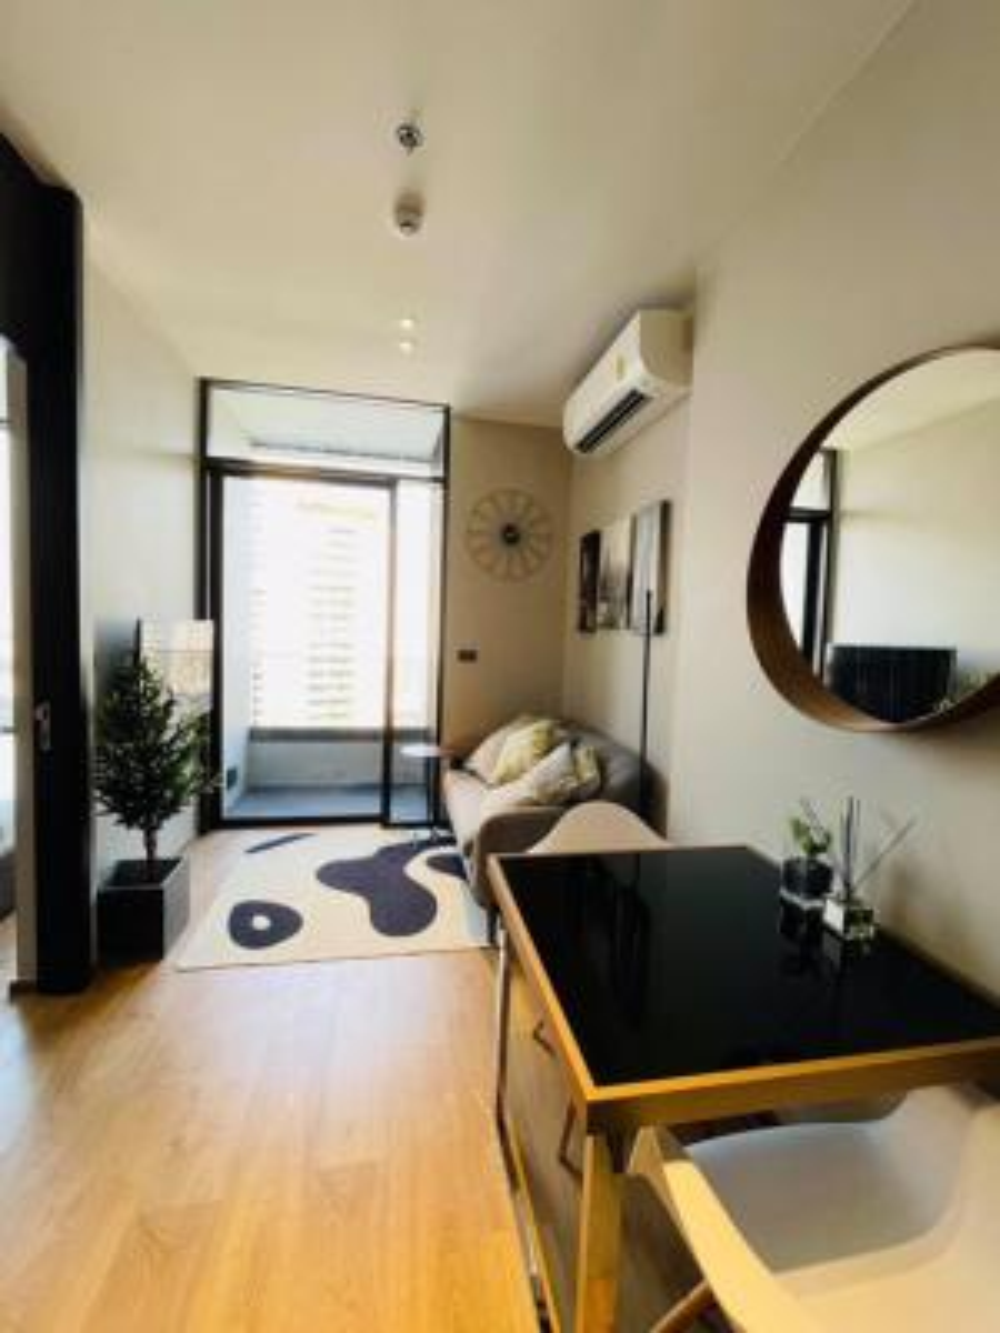 For RentCondoSukhumvit, Asoke, Thonglor : New condo for rent Luxurious in the heart of Thonglor and Ekkamai, The Fine Bangkok Ekkamai 12, size 35 sq.m., floor 22